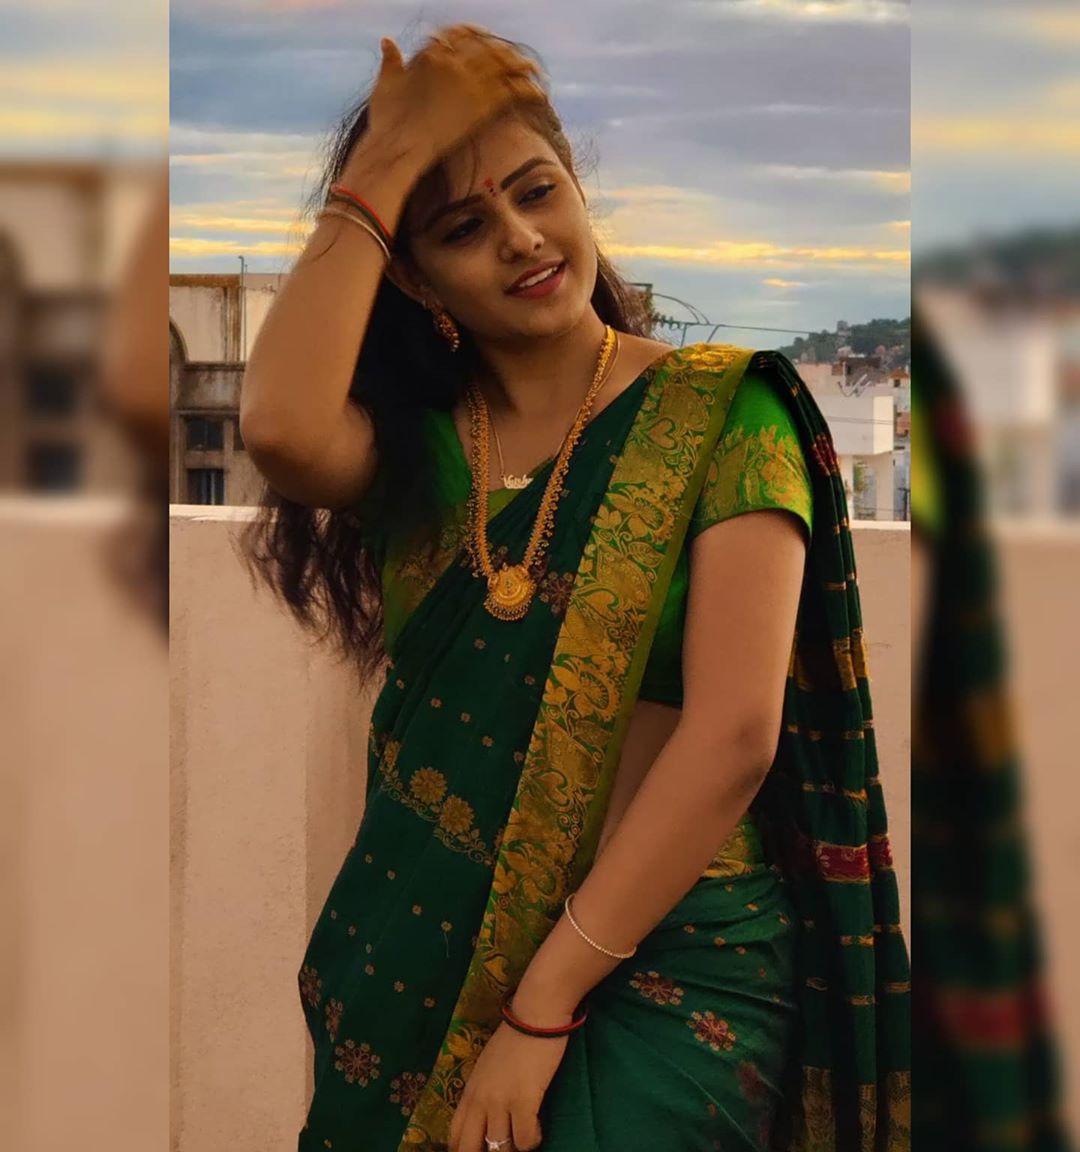 Vaishnavi Chaitanya ❤️❤️ #NewProfilePic